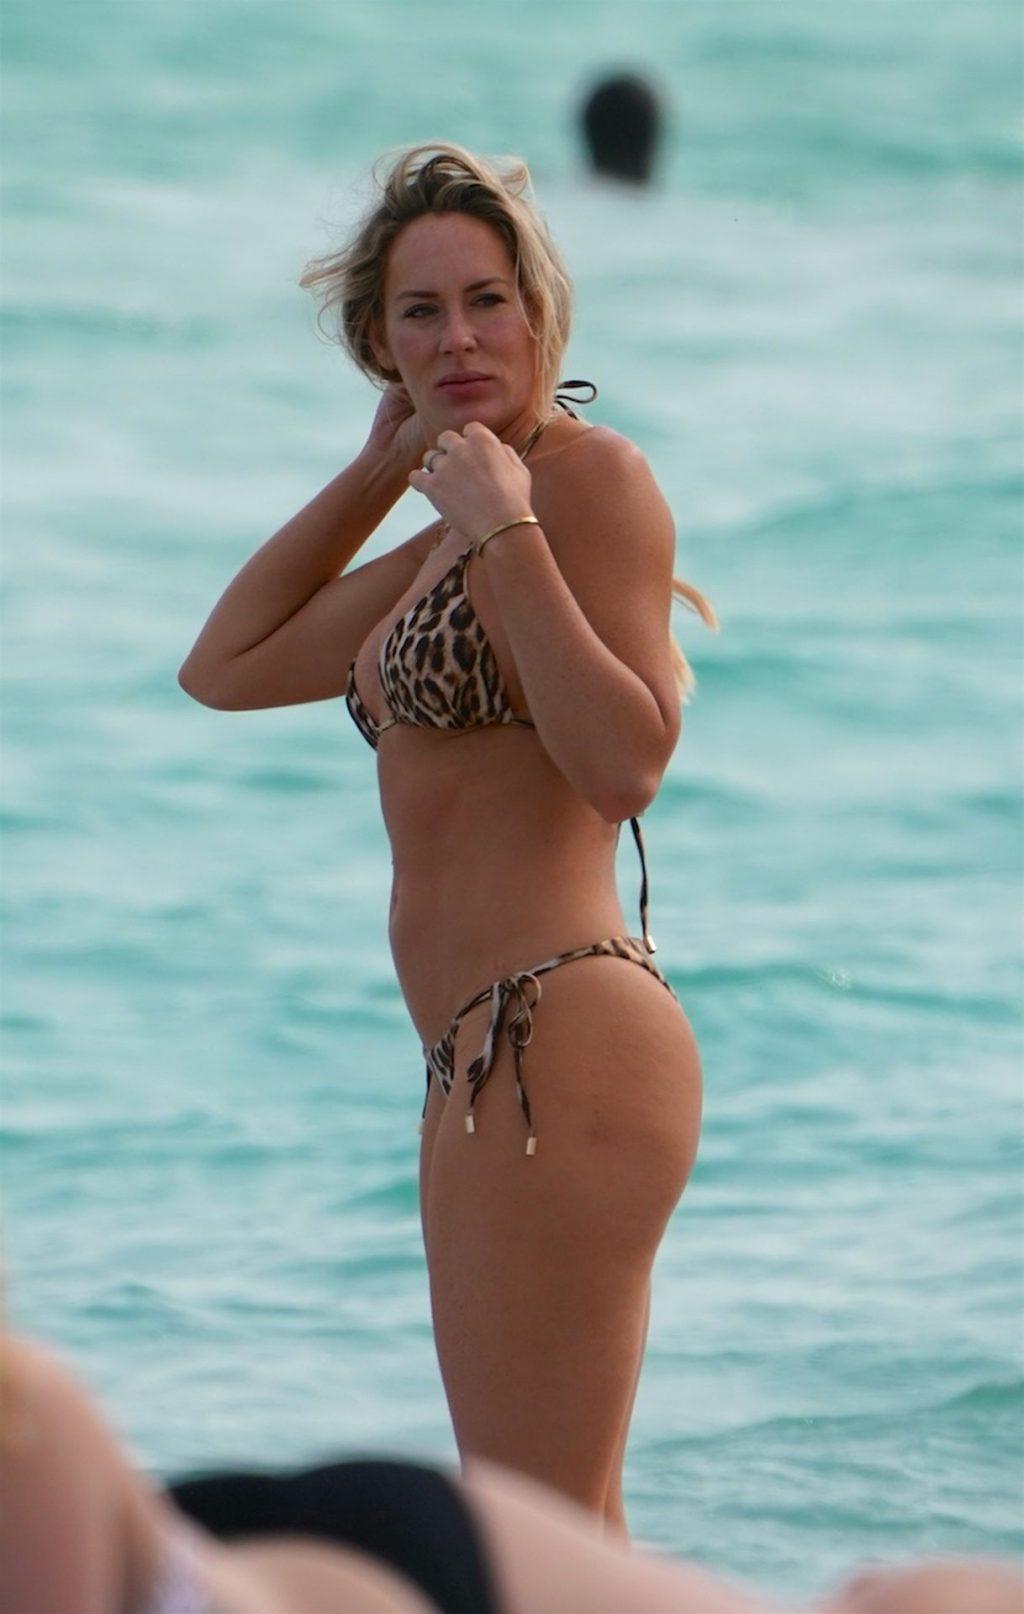 Super Bowl WAG Stephanie Toilolo Is In a Bikini at The Beach In Miami (7 Photos)